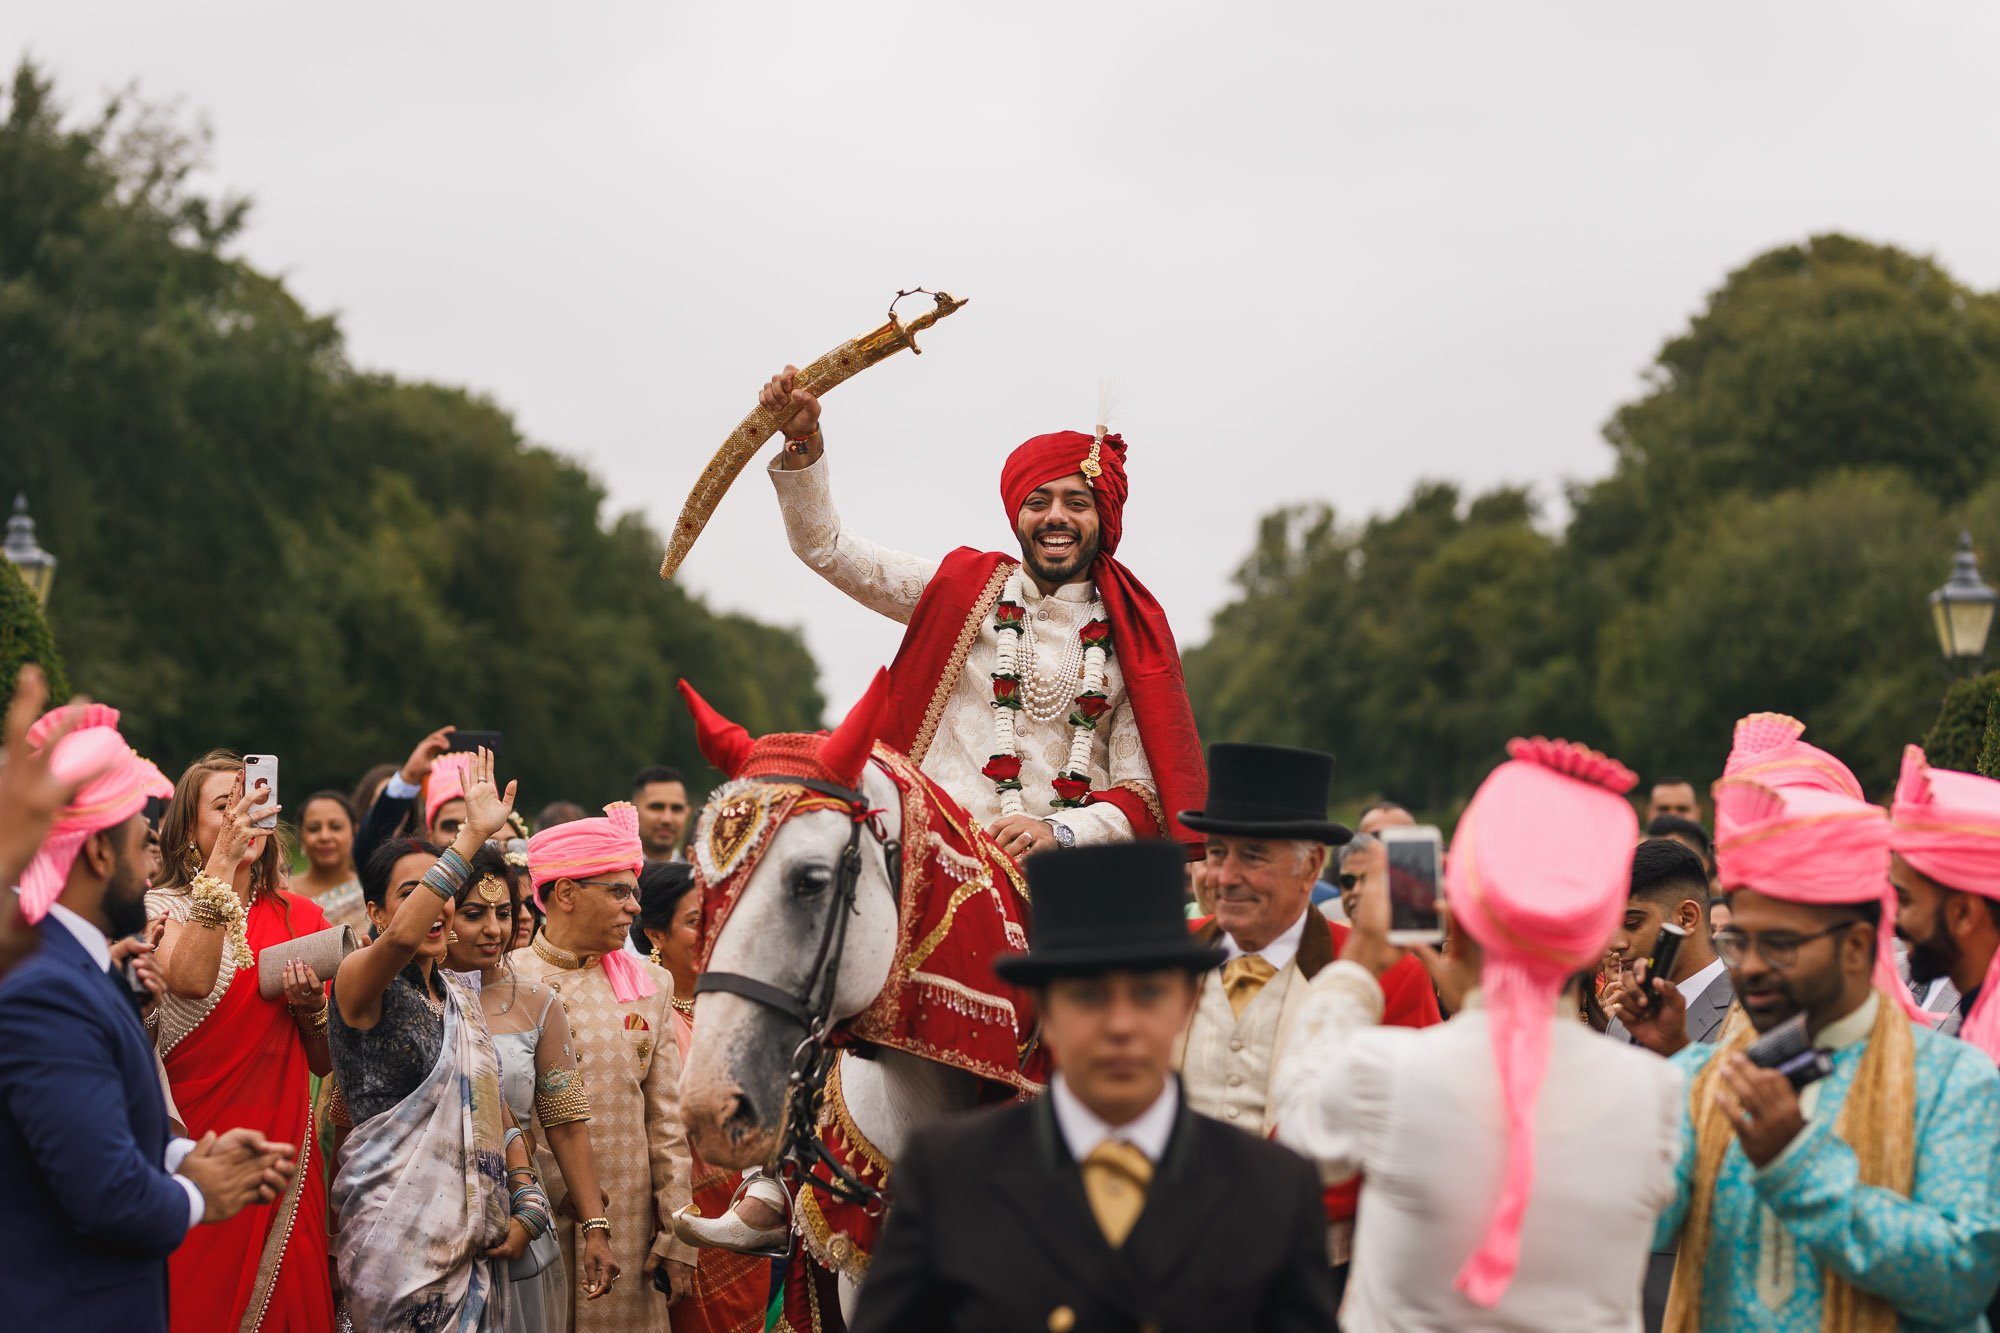 Heythrop Park Hotel, Oxfordshire, Groom arrival, horse